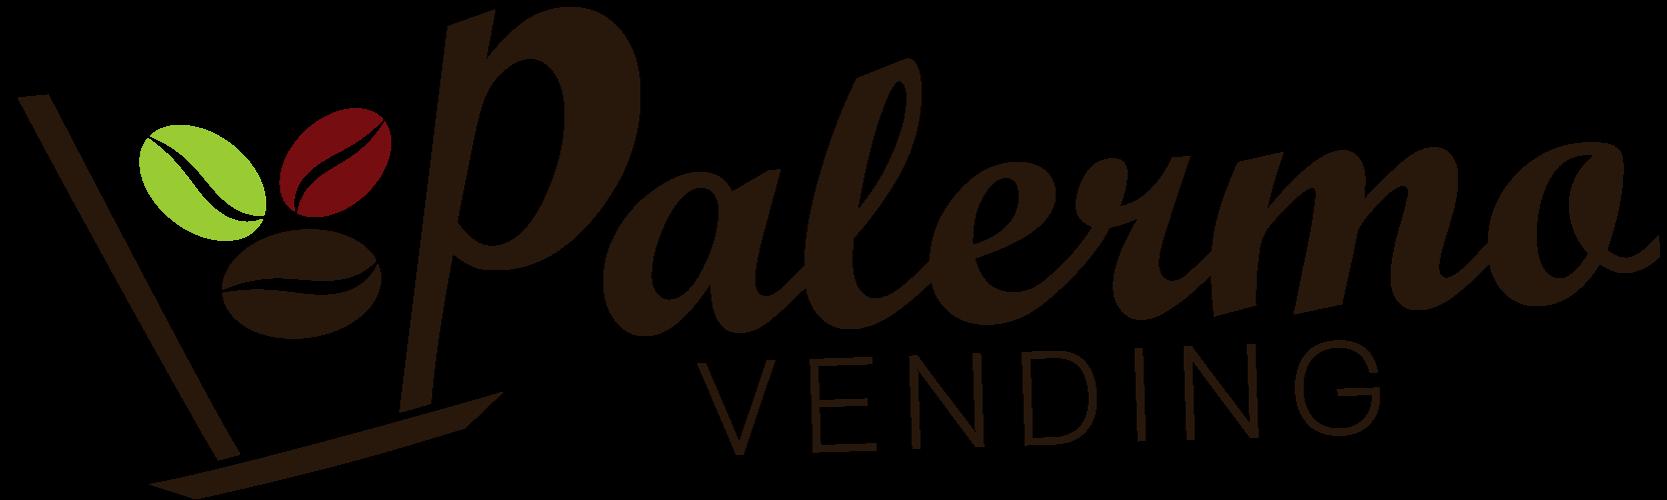 Palermo Vending logo